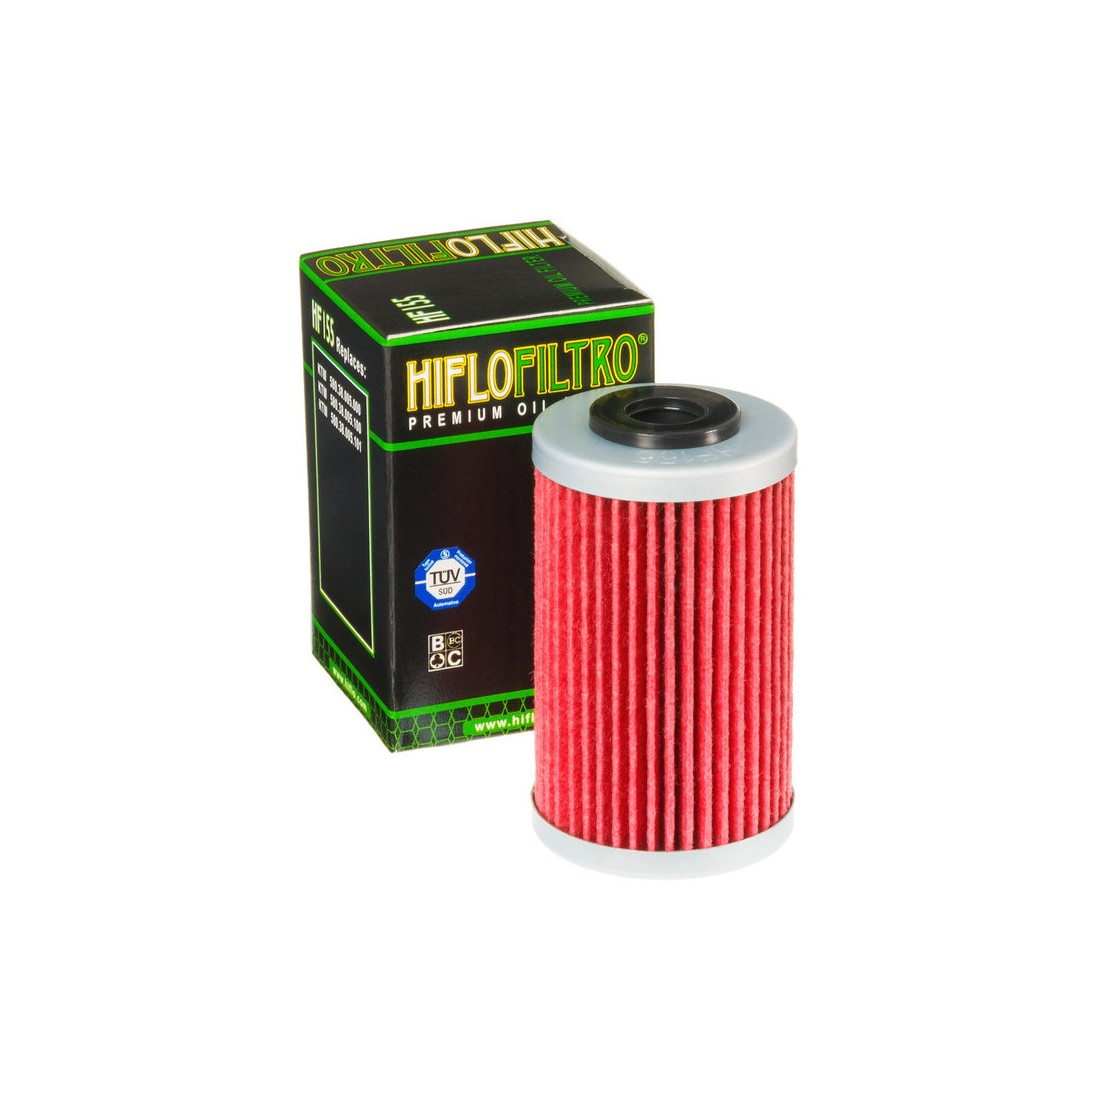 Filtro Aceite Hiflofiltro HF155